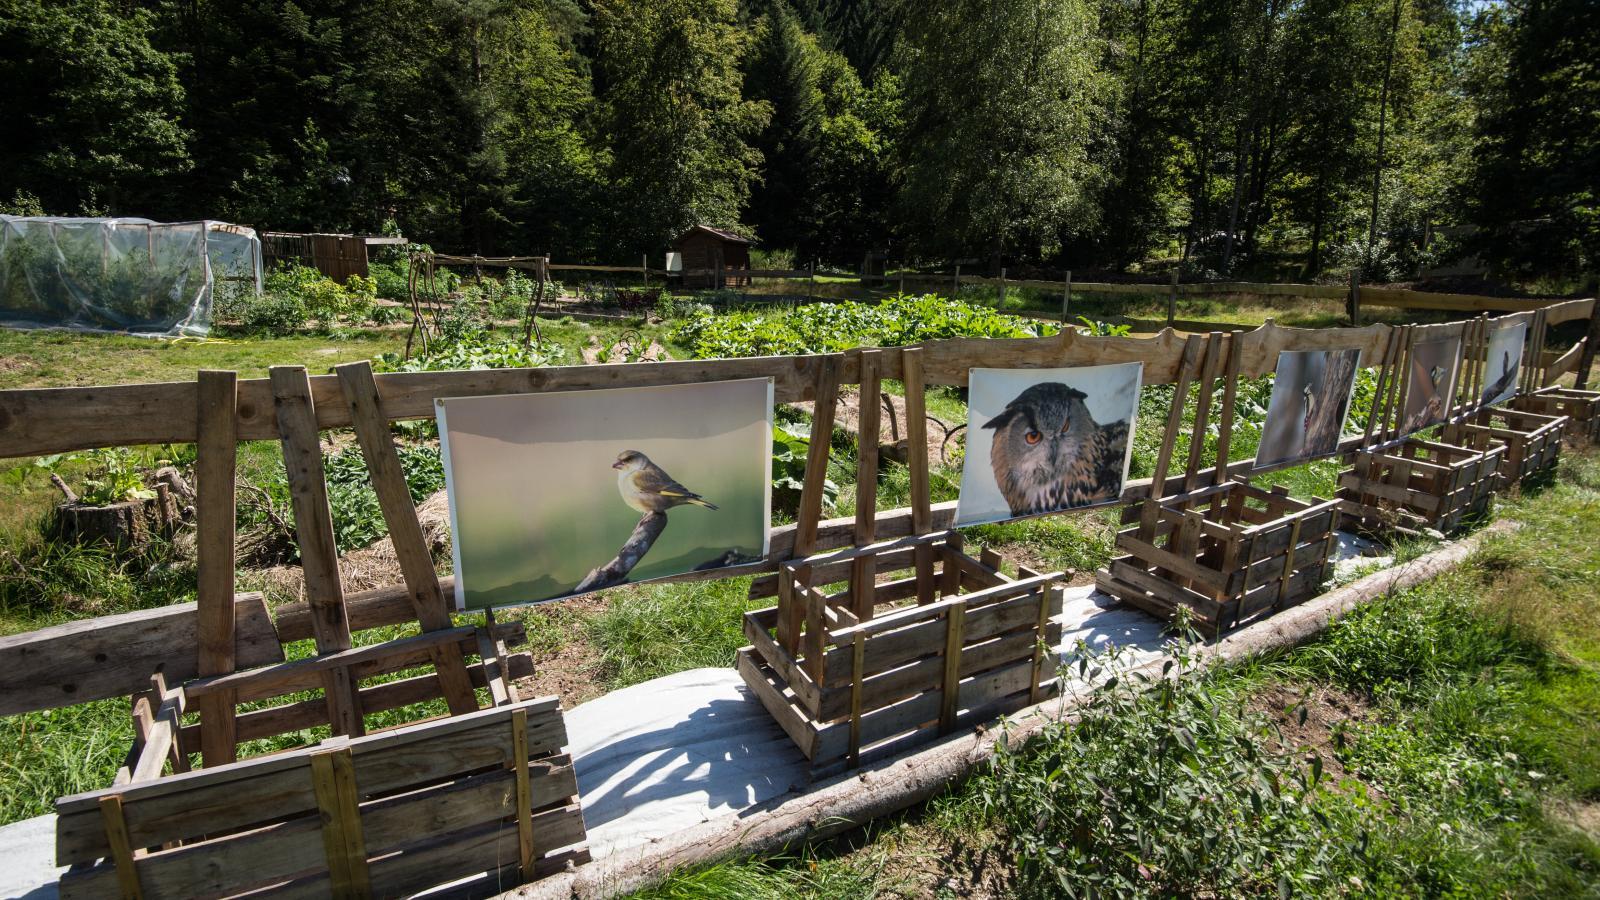 Jardins u00e9cologogiques Camping du Metey